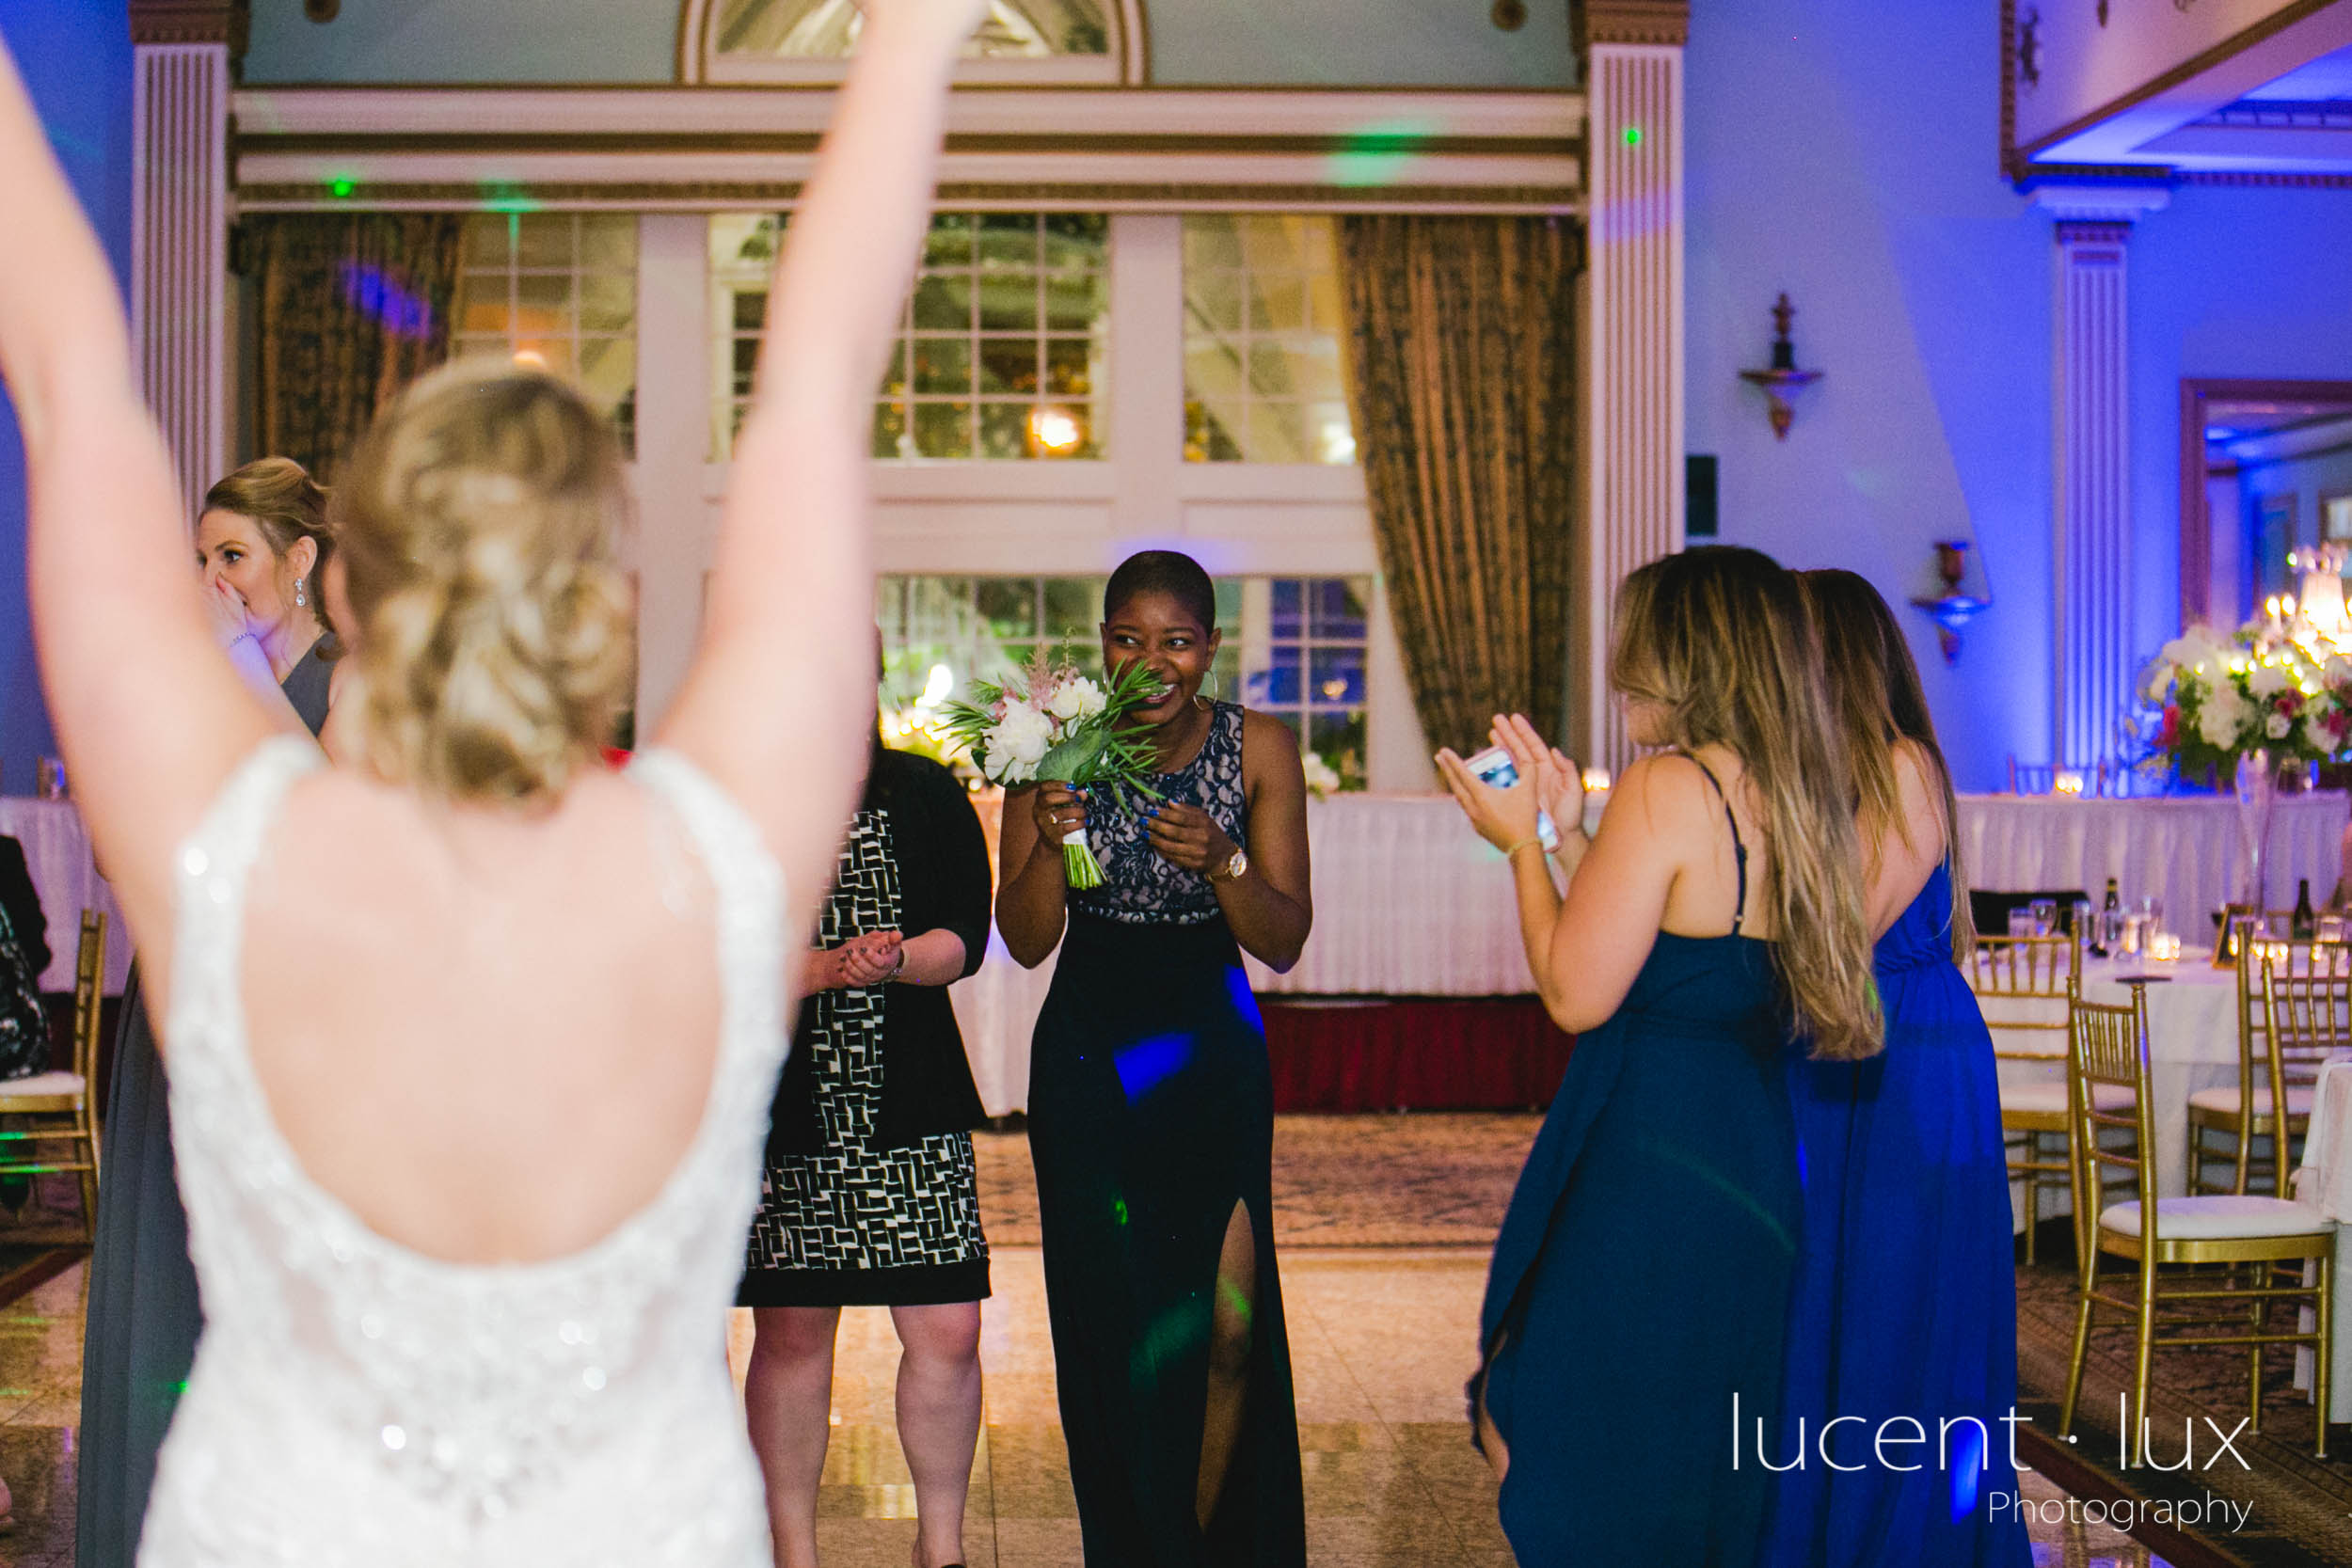 Wedding-Photography-Maryland-Pennsylvania-Photographer-Mendenhall-Inn-Media-Portrait-Event-158.jpg